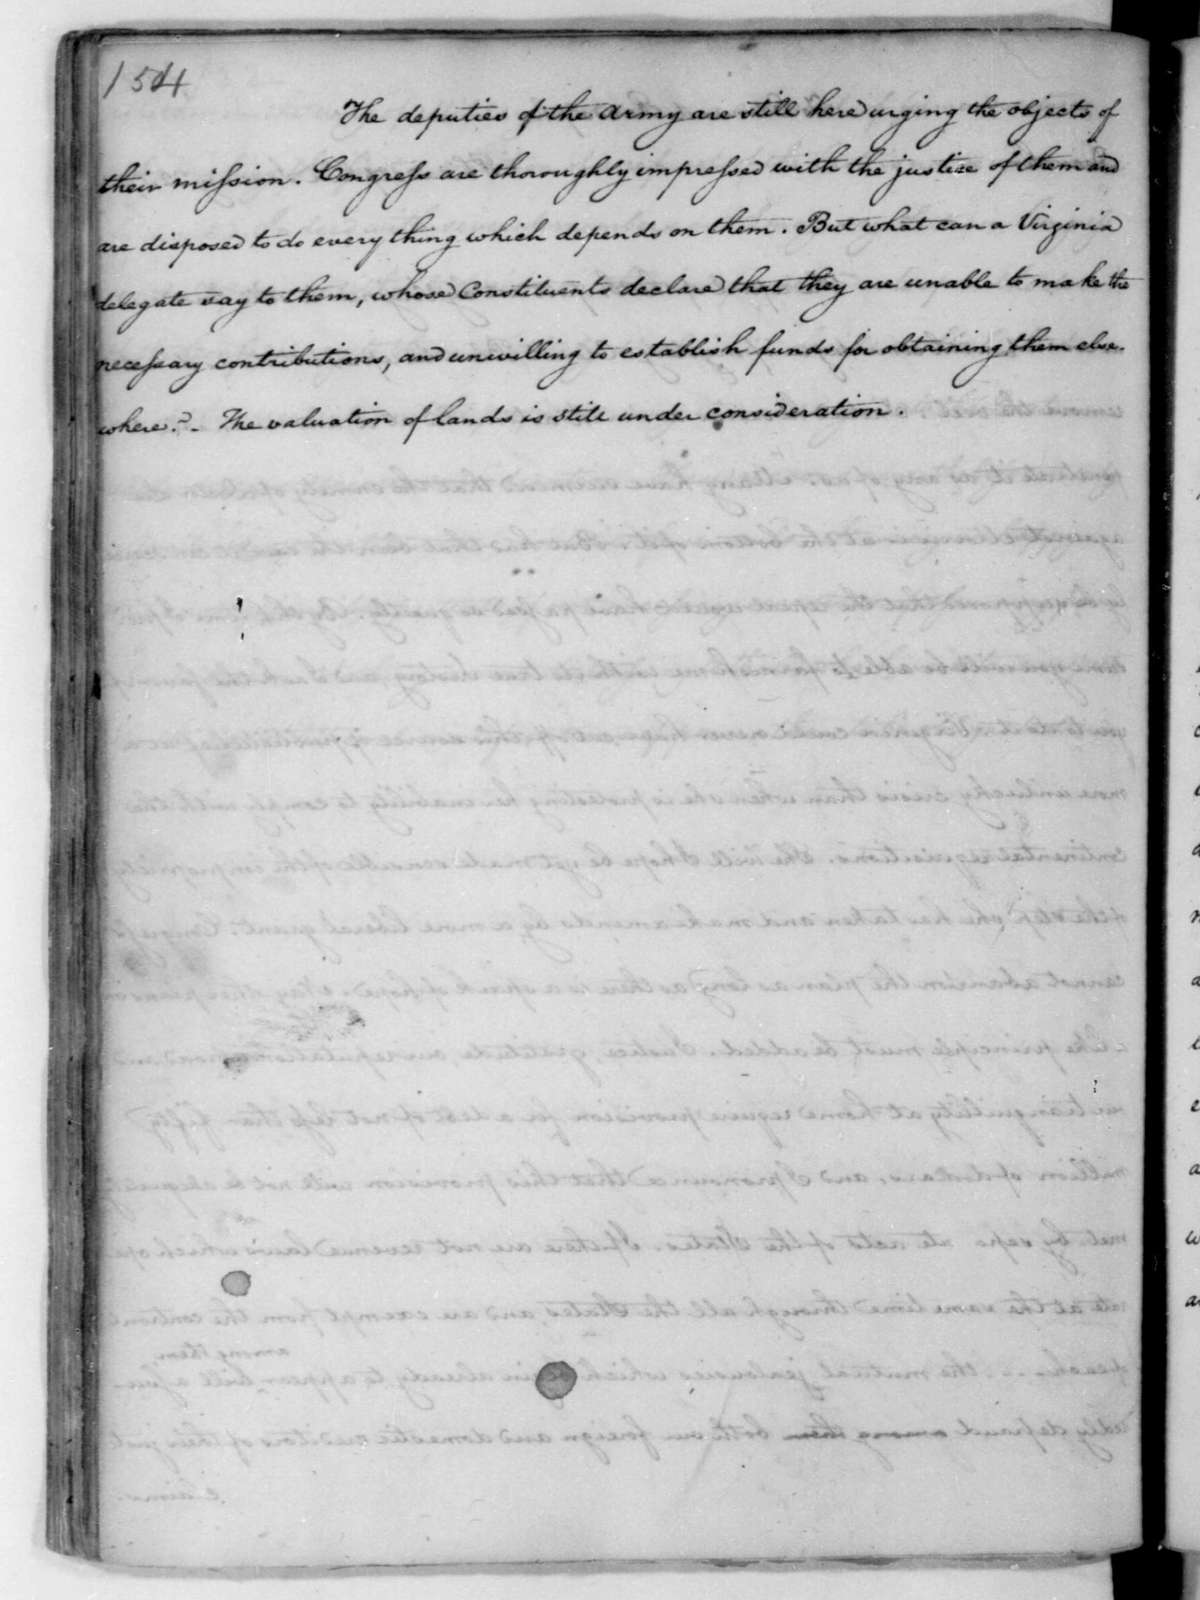 James Madison to Edmund Randolph, January 22, 1782.